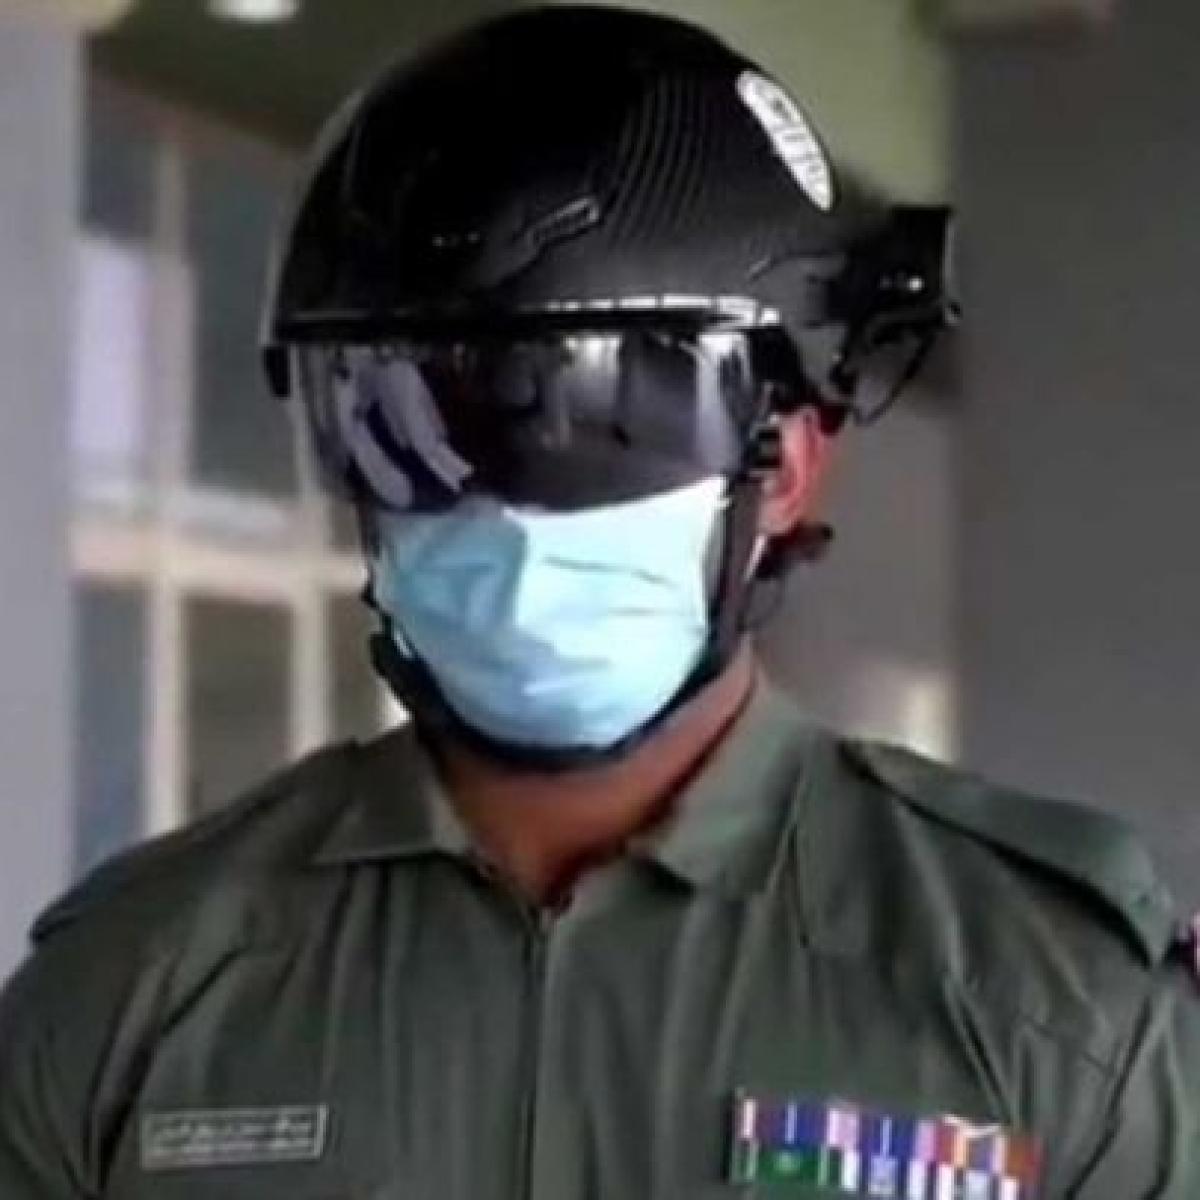 UAE uses smart helmets to detect high body temperature amid coronavirus pandemic